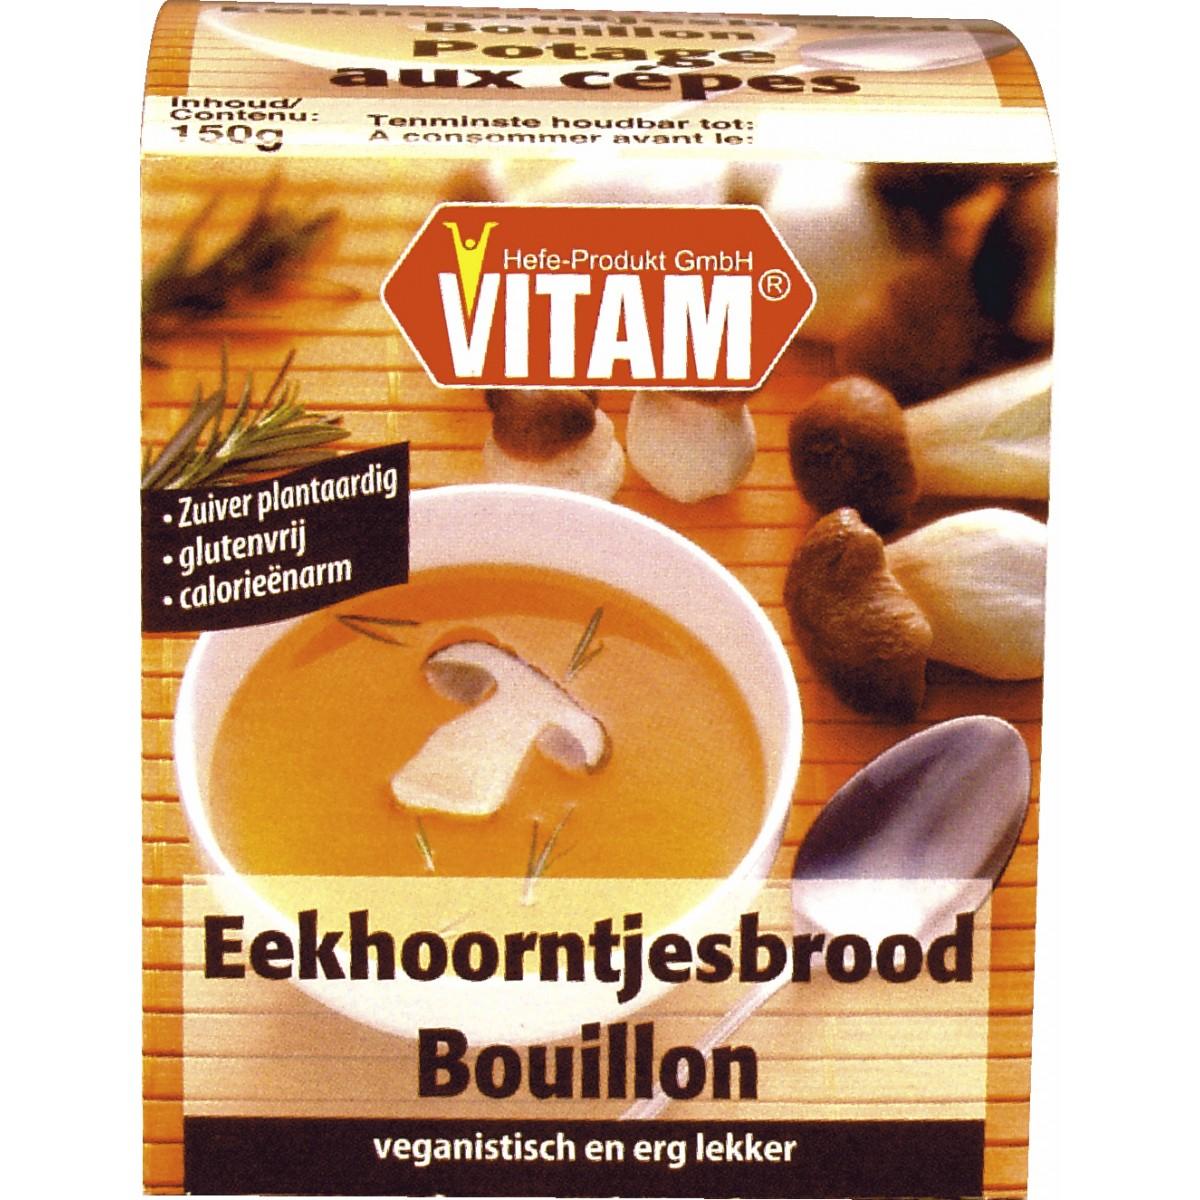 Eekhoorntjesbrood Bouillon